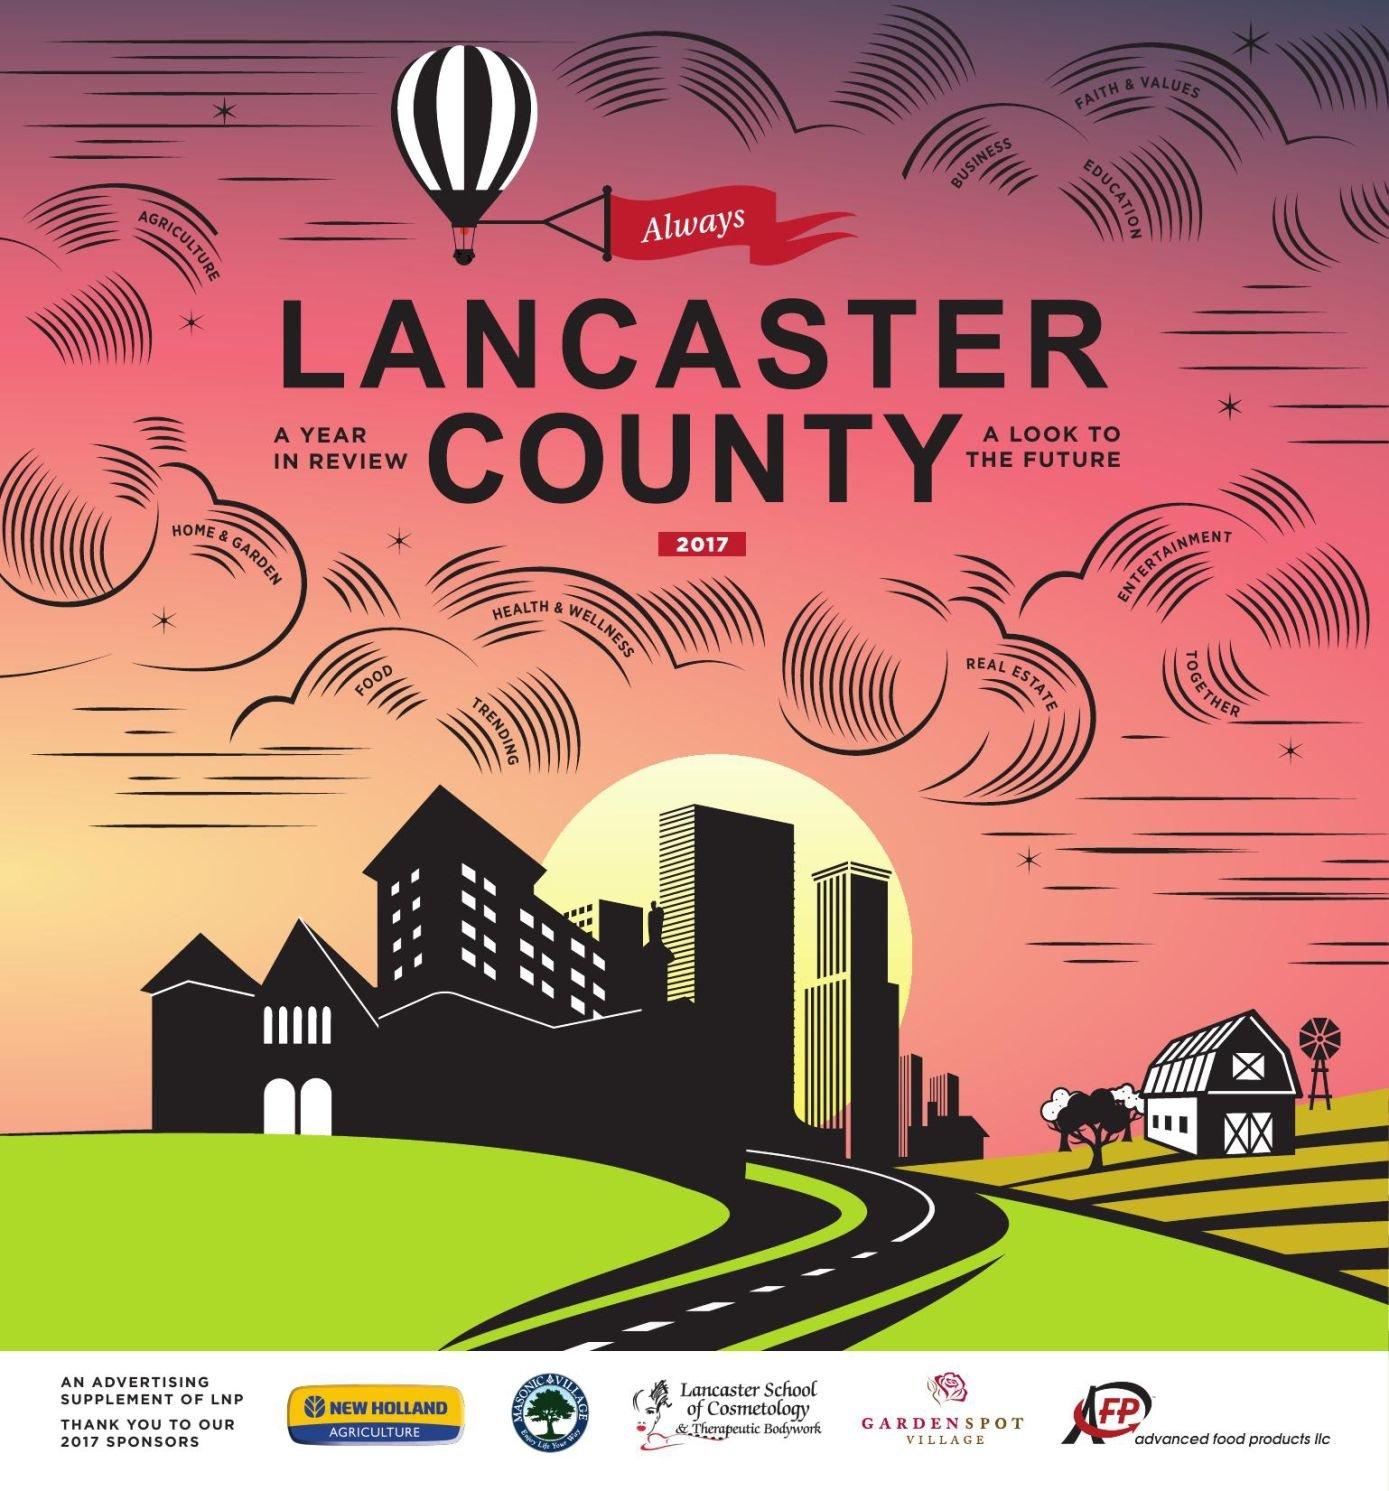 always lancaster county